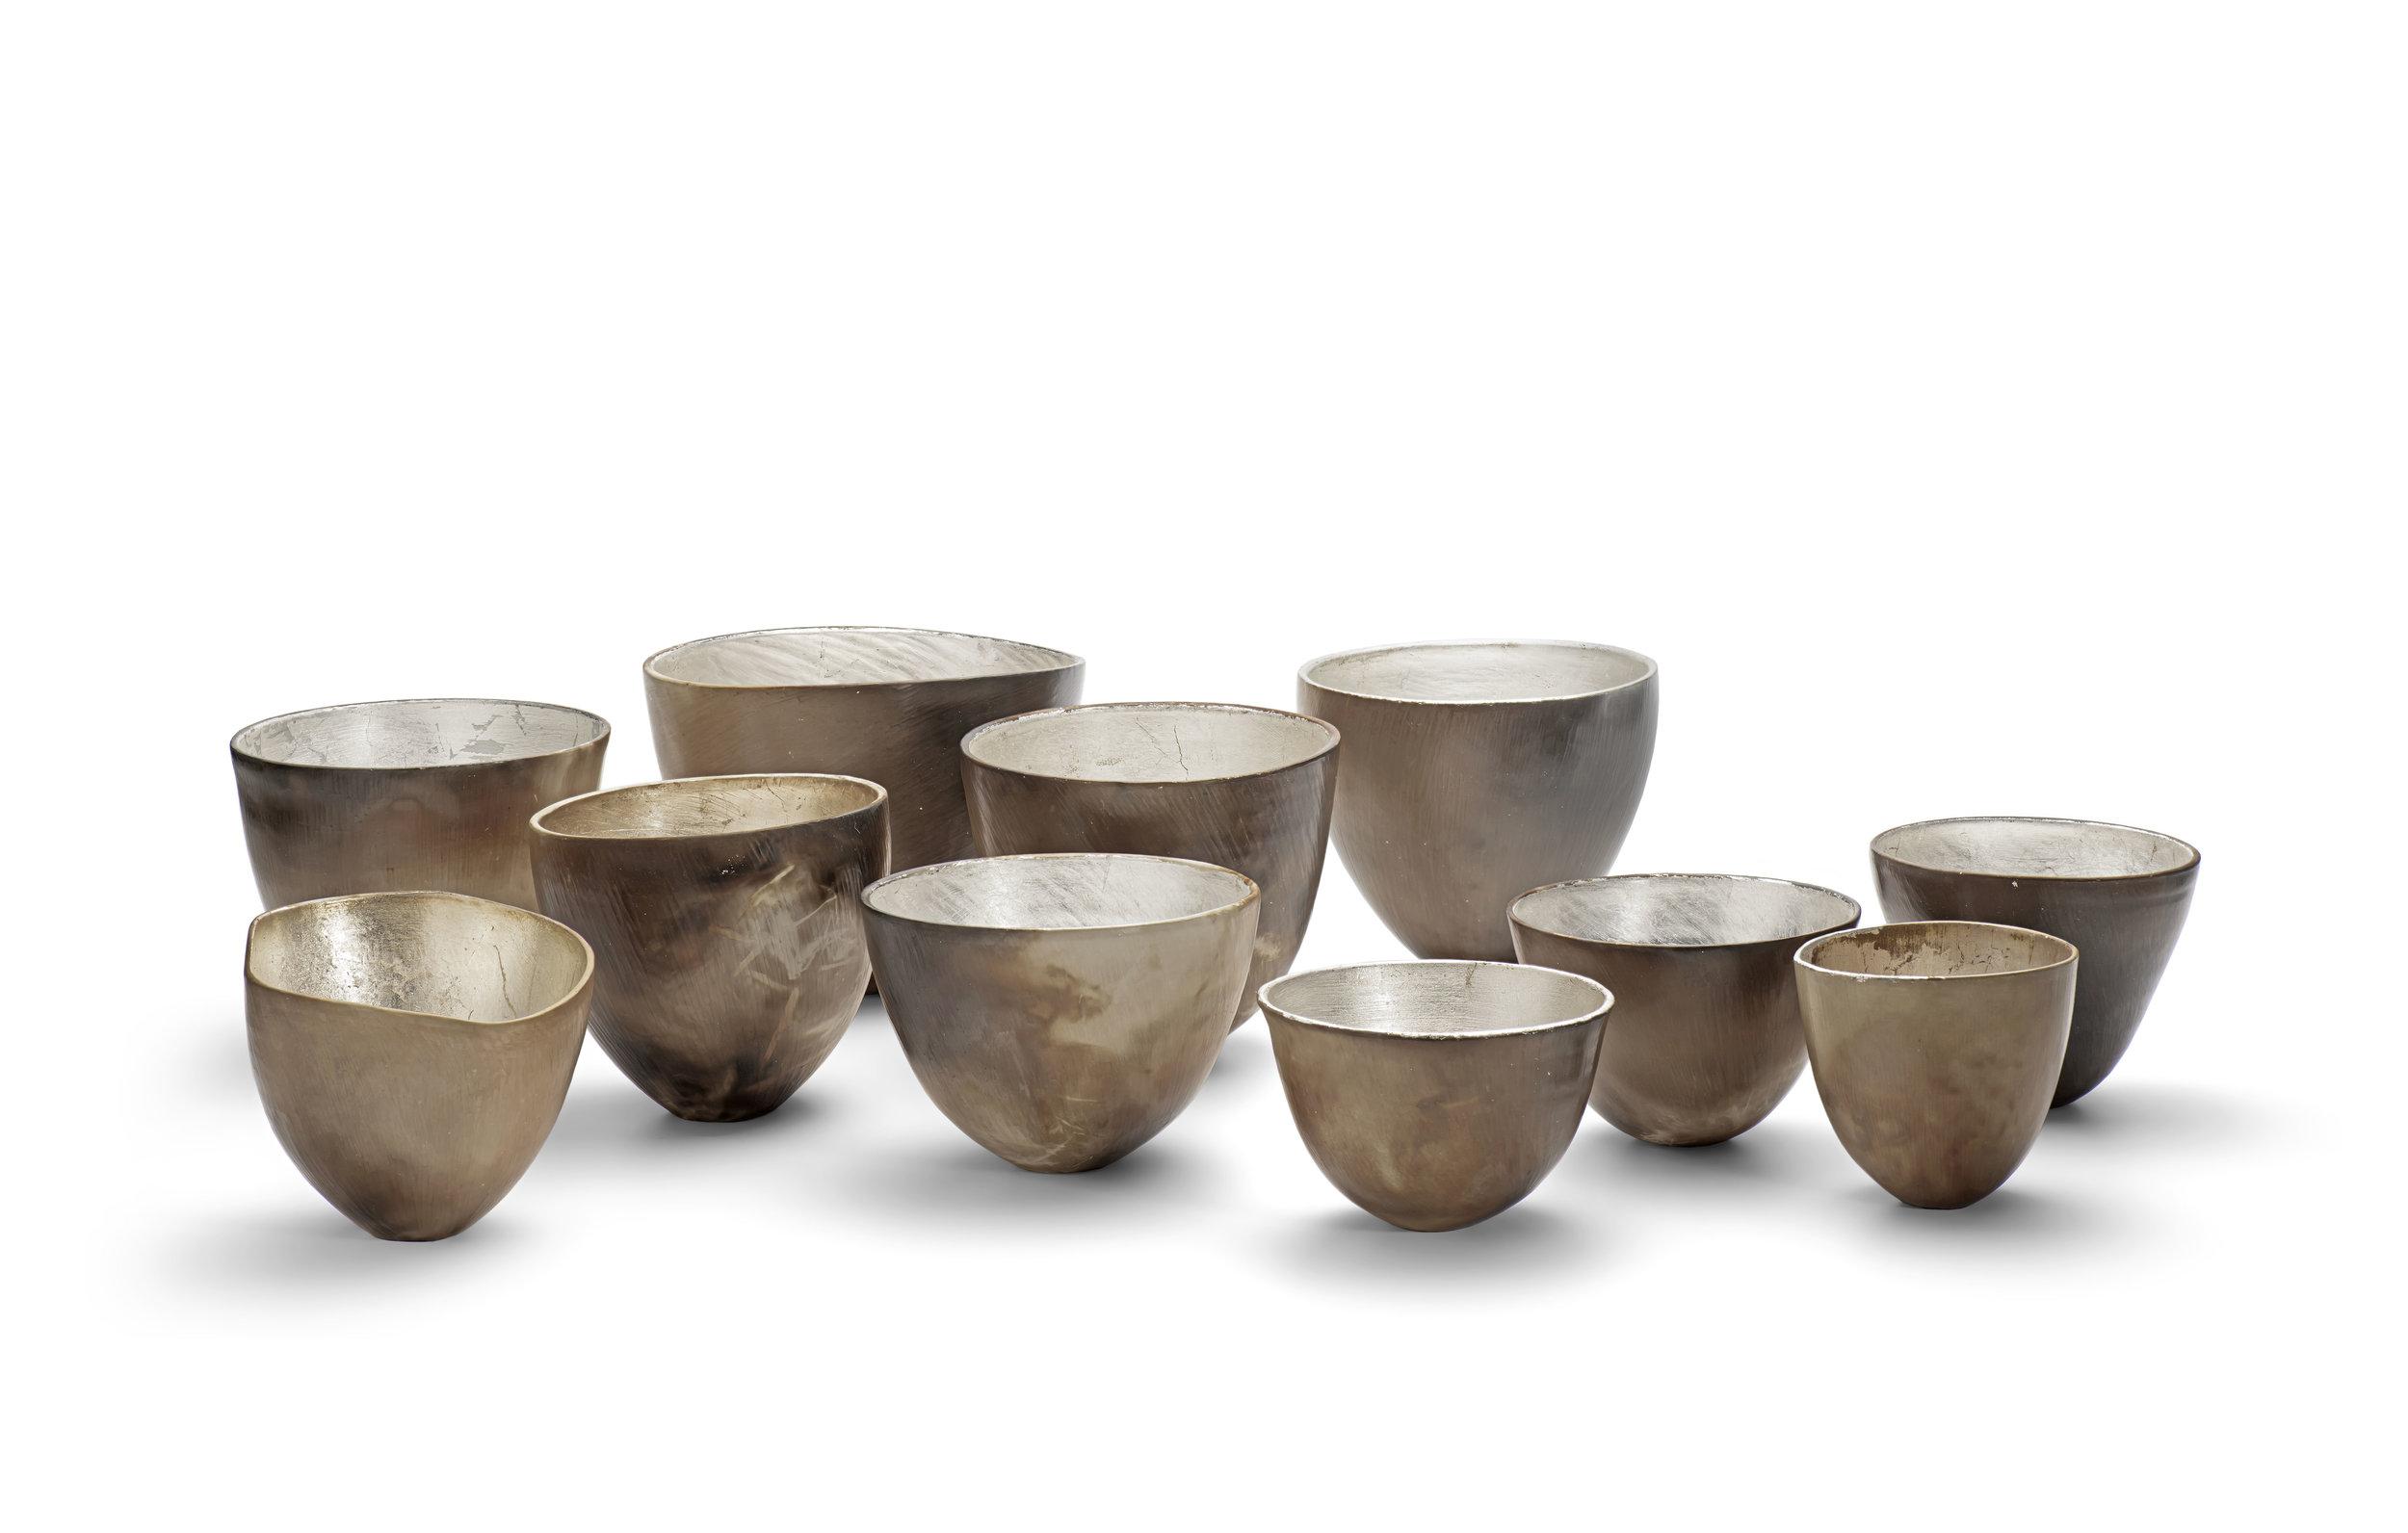 silver ceramic bowls